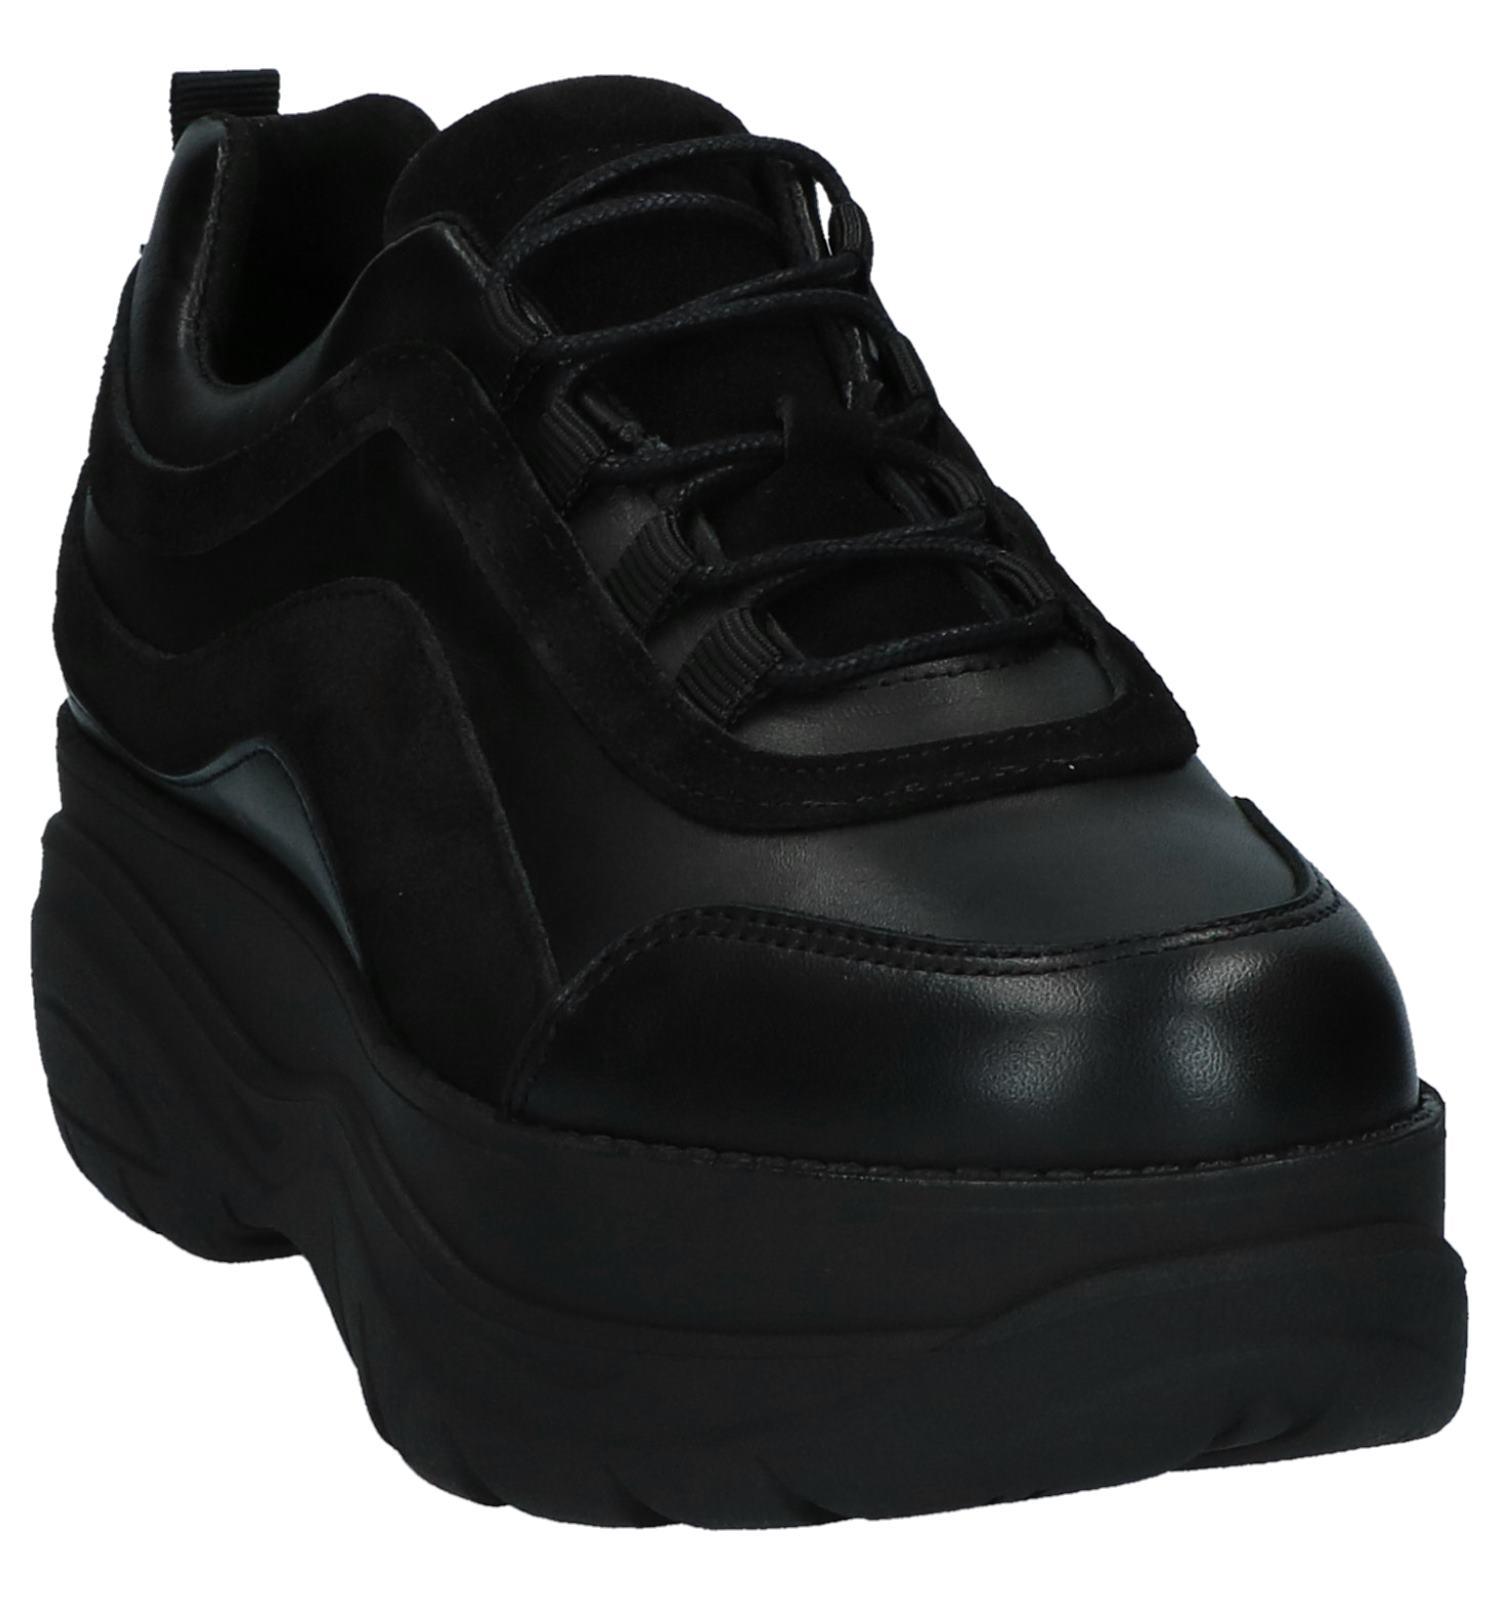 Verzend Bullboxer En be Gratis Sneakers Torfs Plateau Zwarte Met 1wftq0w